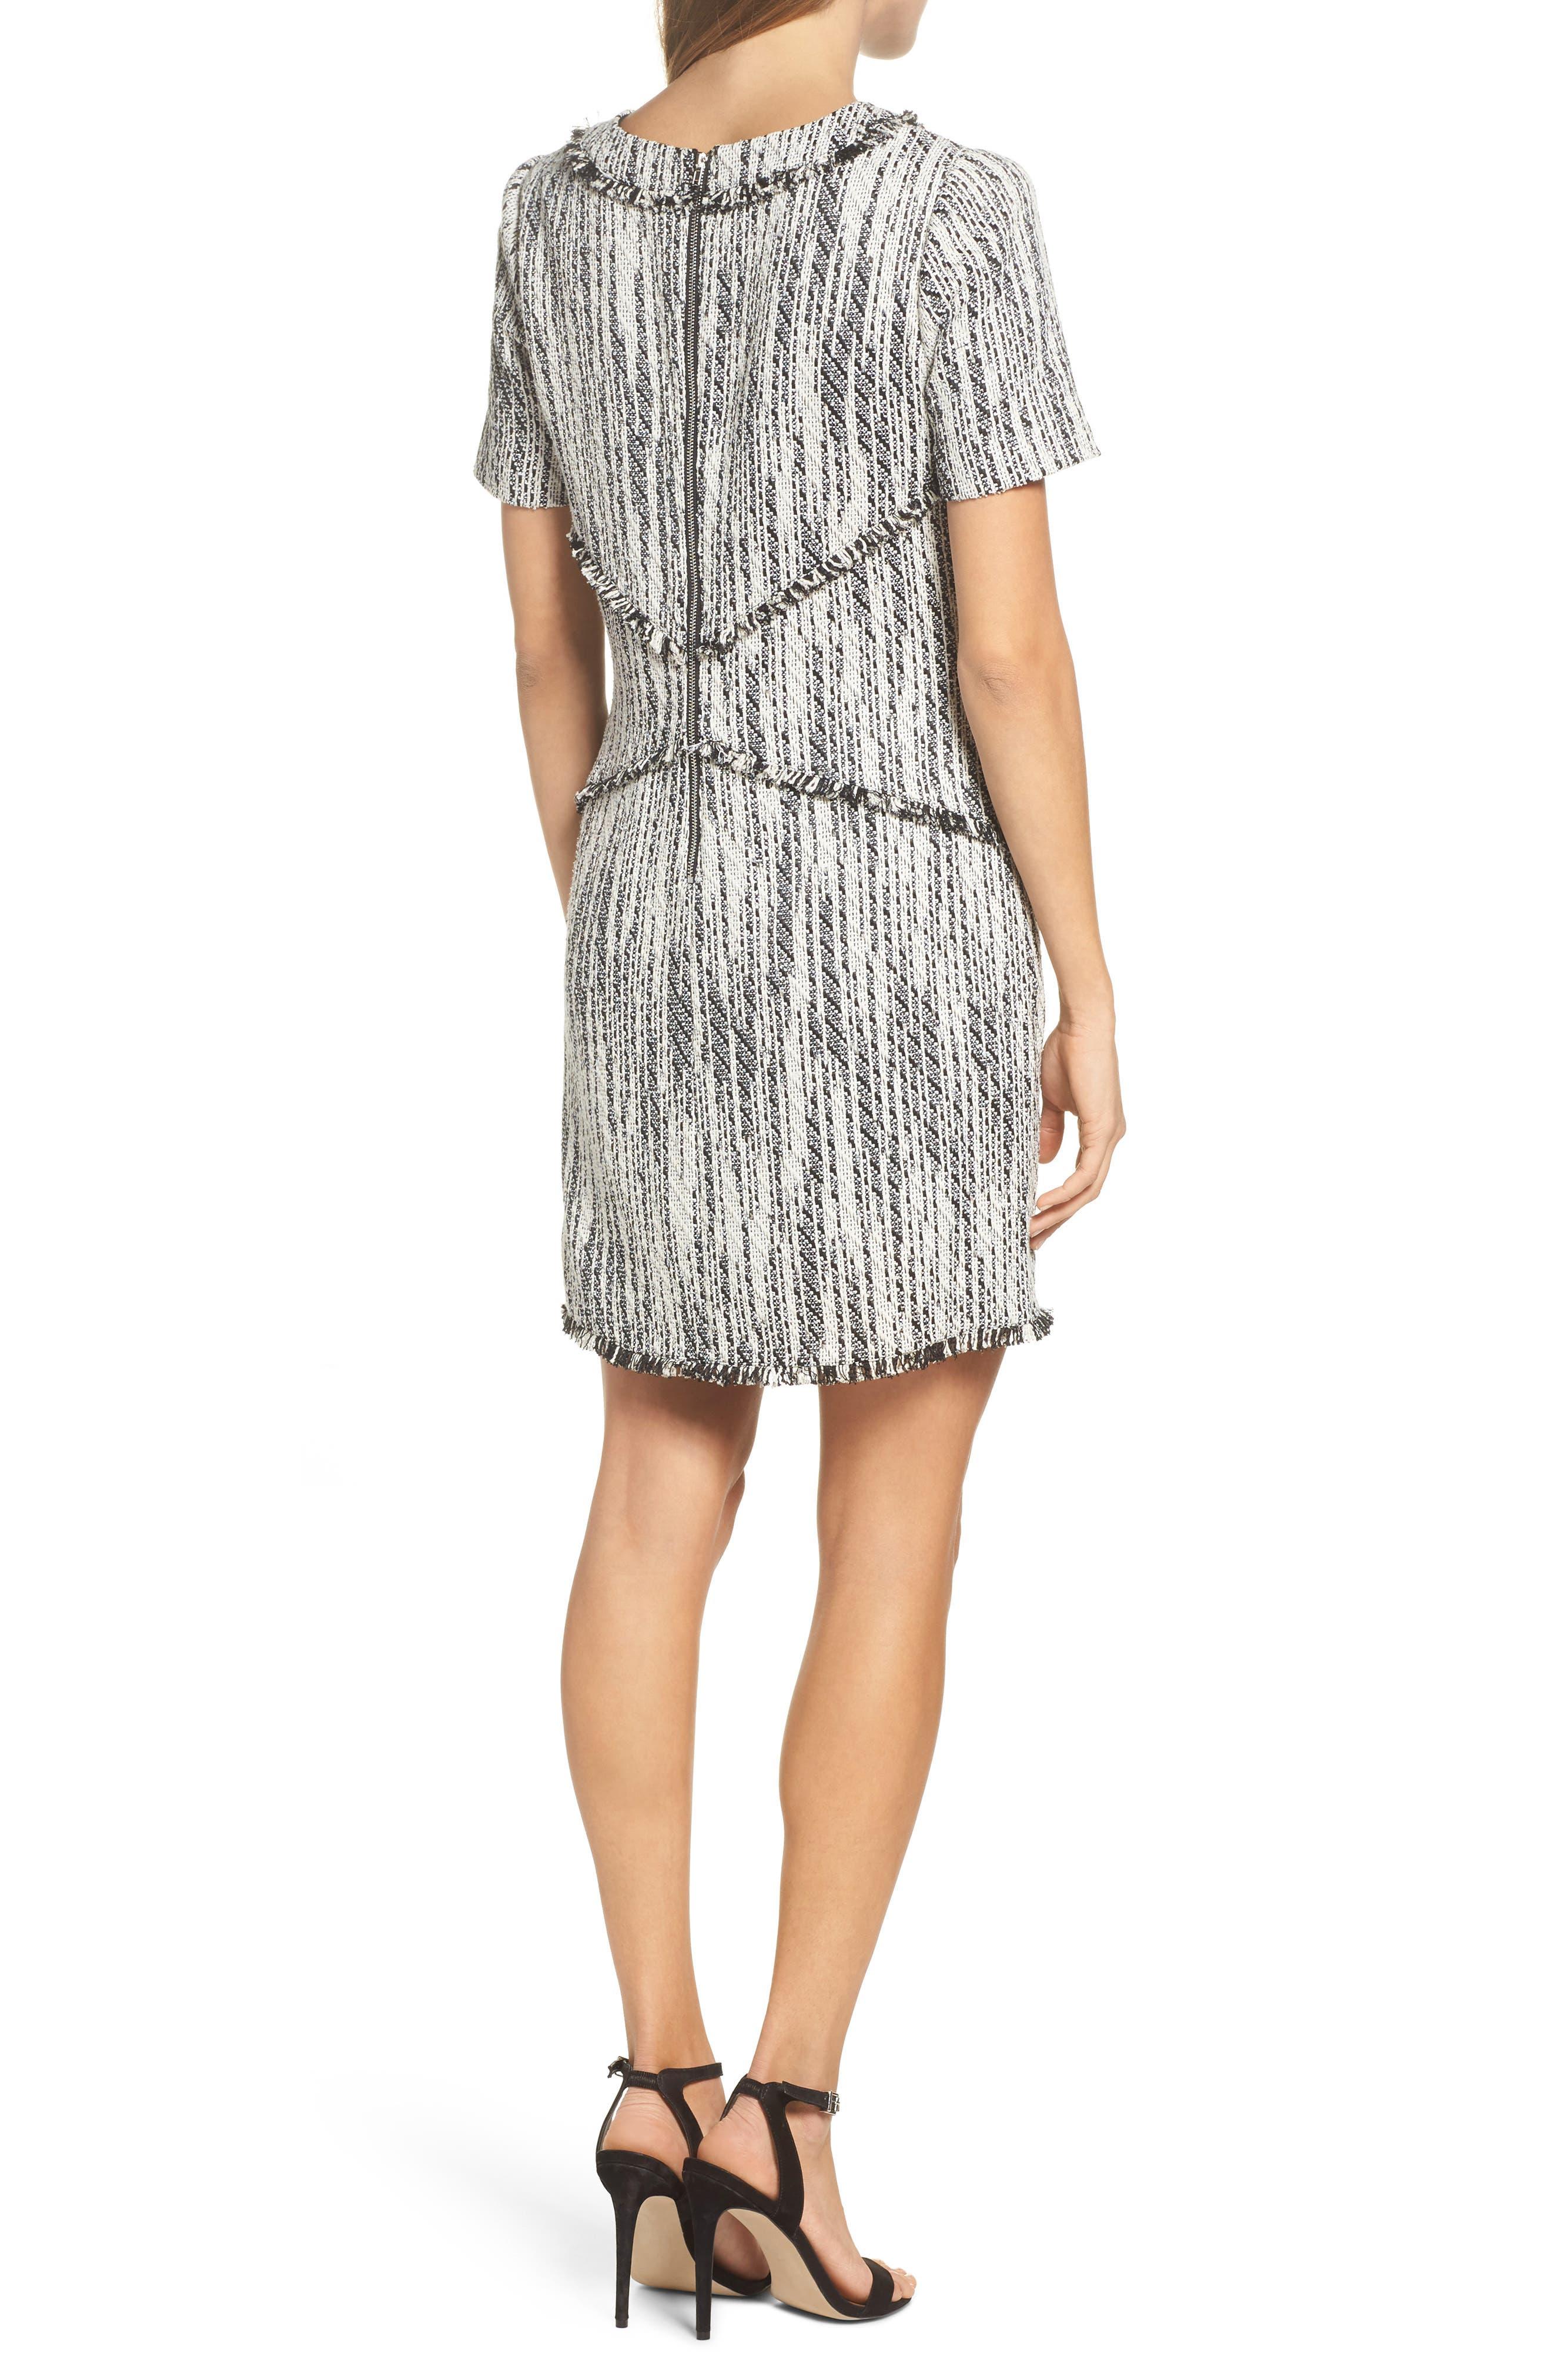 Dolce Vita Tweed Shift Dress,                             Alternate thumbnail 2, color,                             100